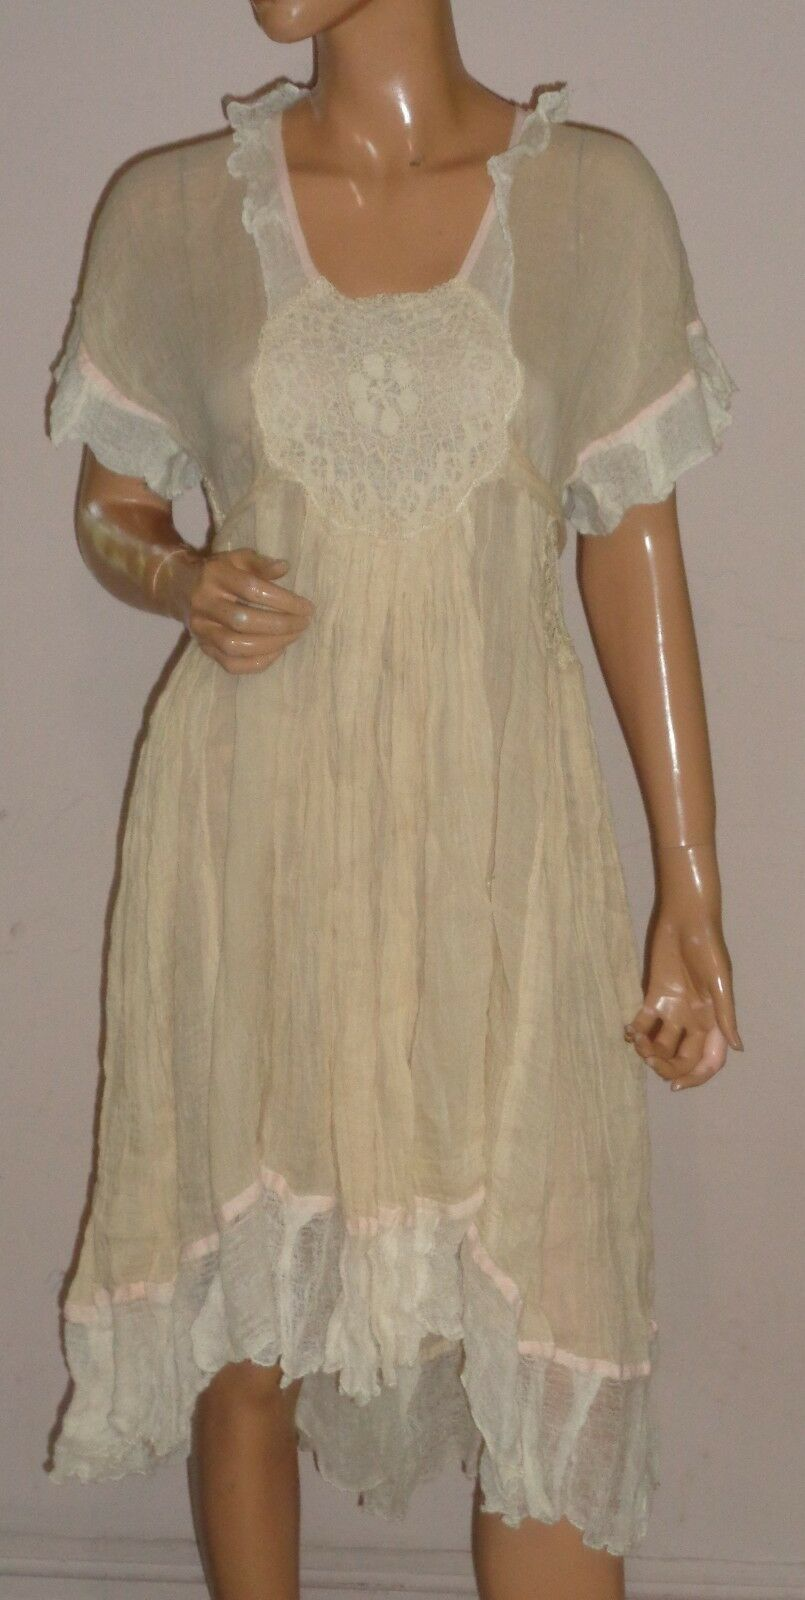 SESTRA MOJA  IVORY CREAM ROMANTIC CHEESE CLOTH  JANINE  PEASANT DRESS NWT SZ S